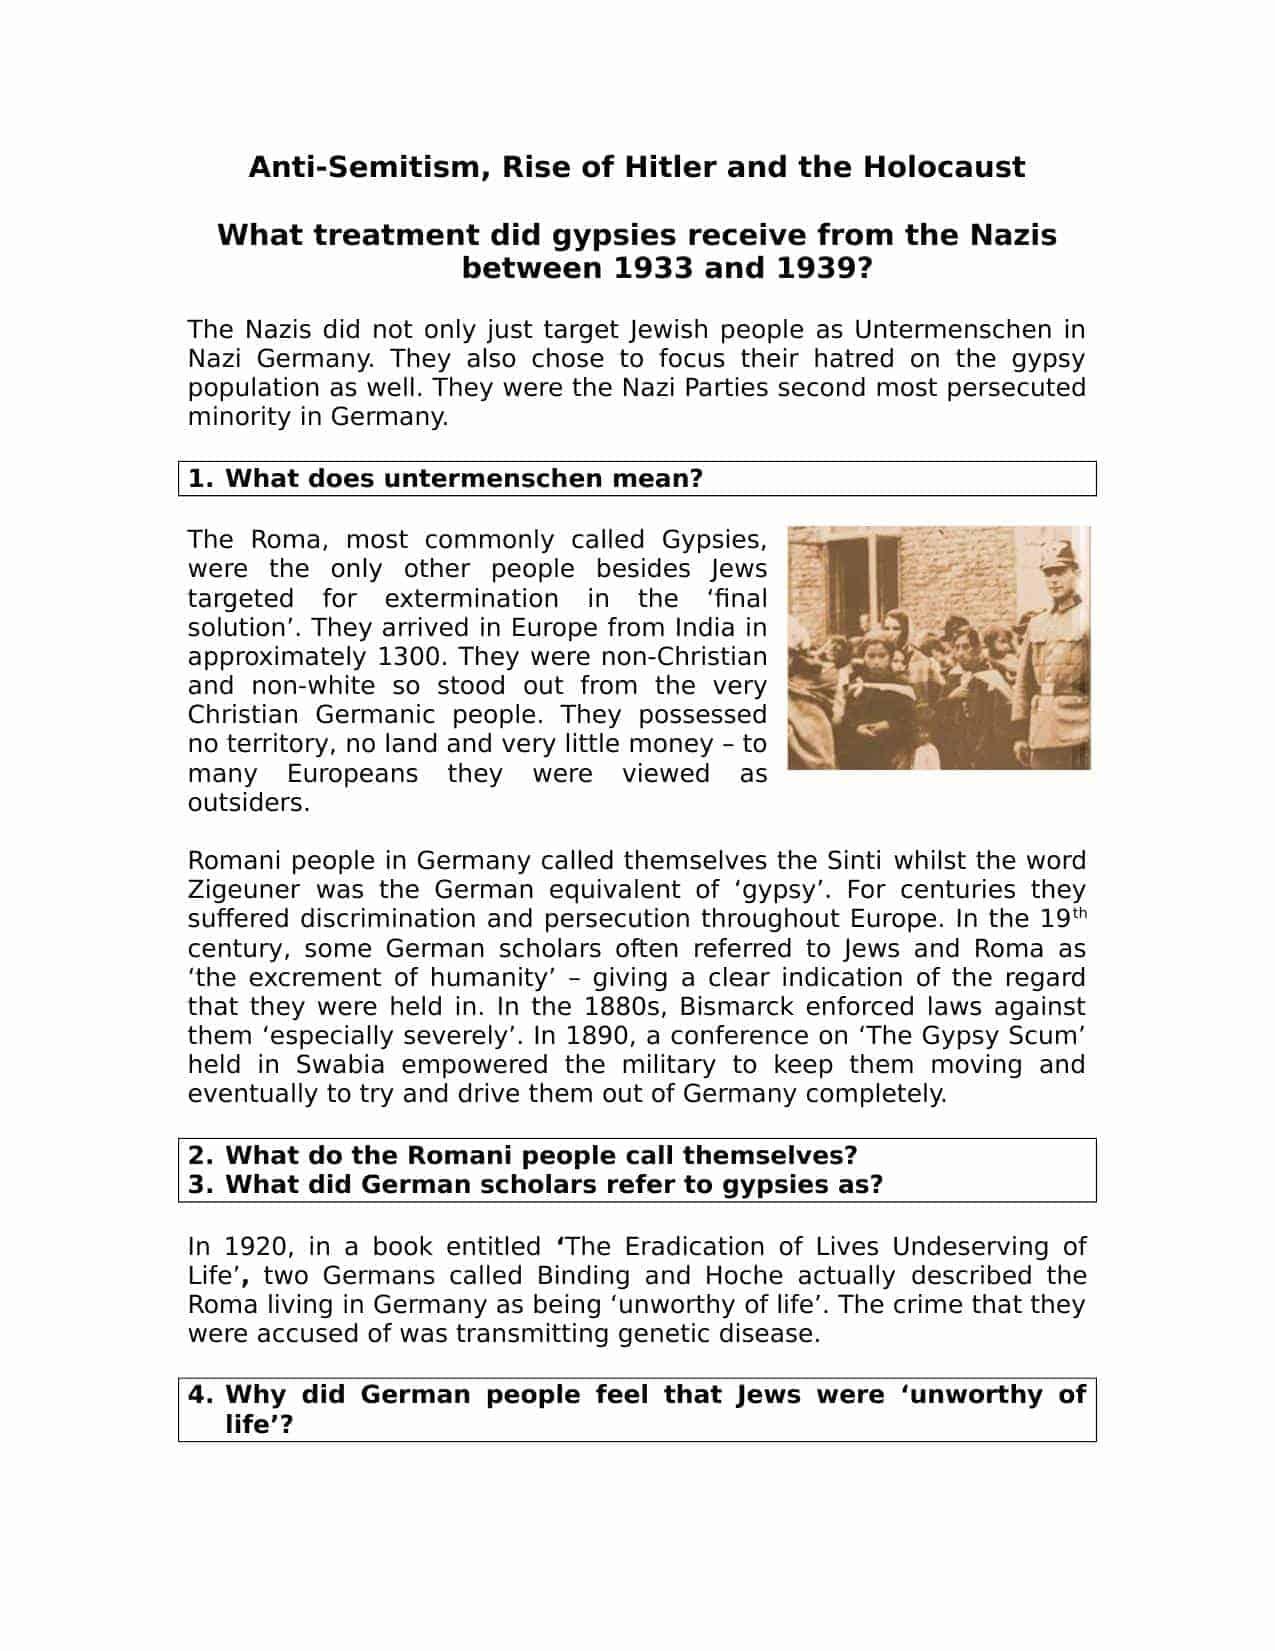 Treatment Of Gypsies In Nazi Germany